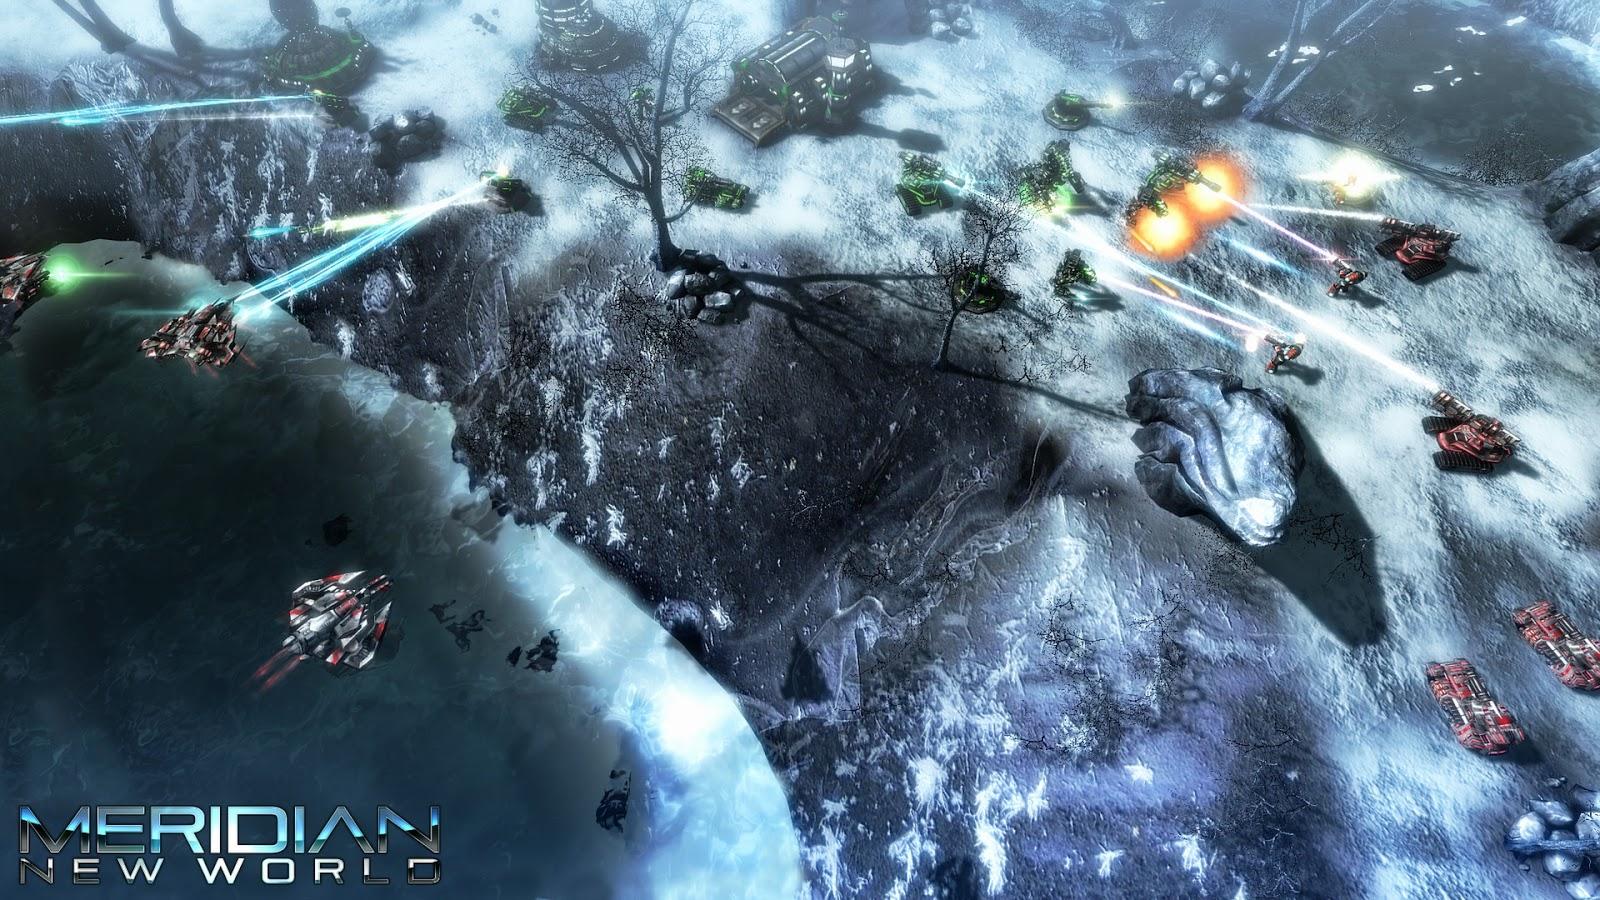 Meridian New World PC Gameplay